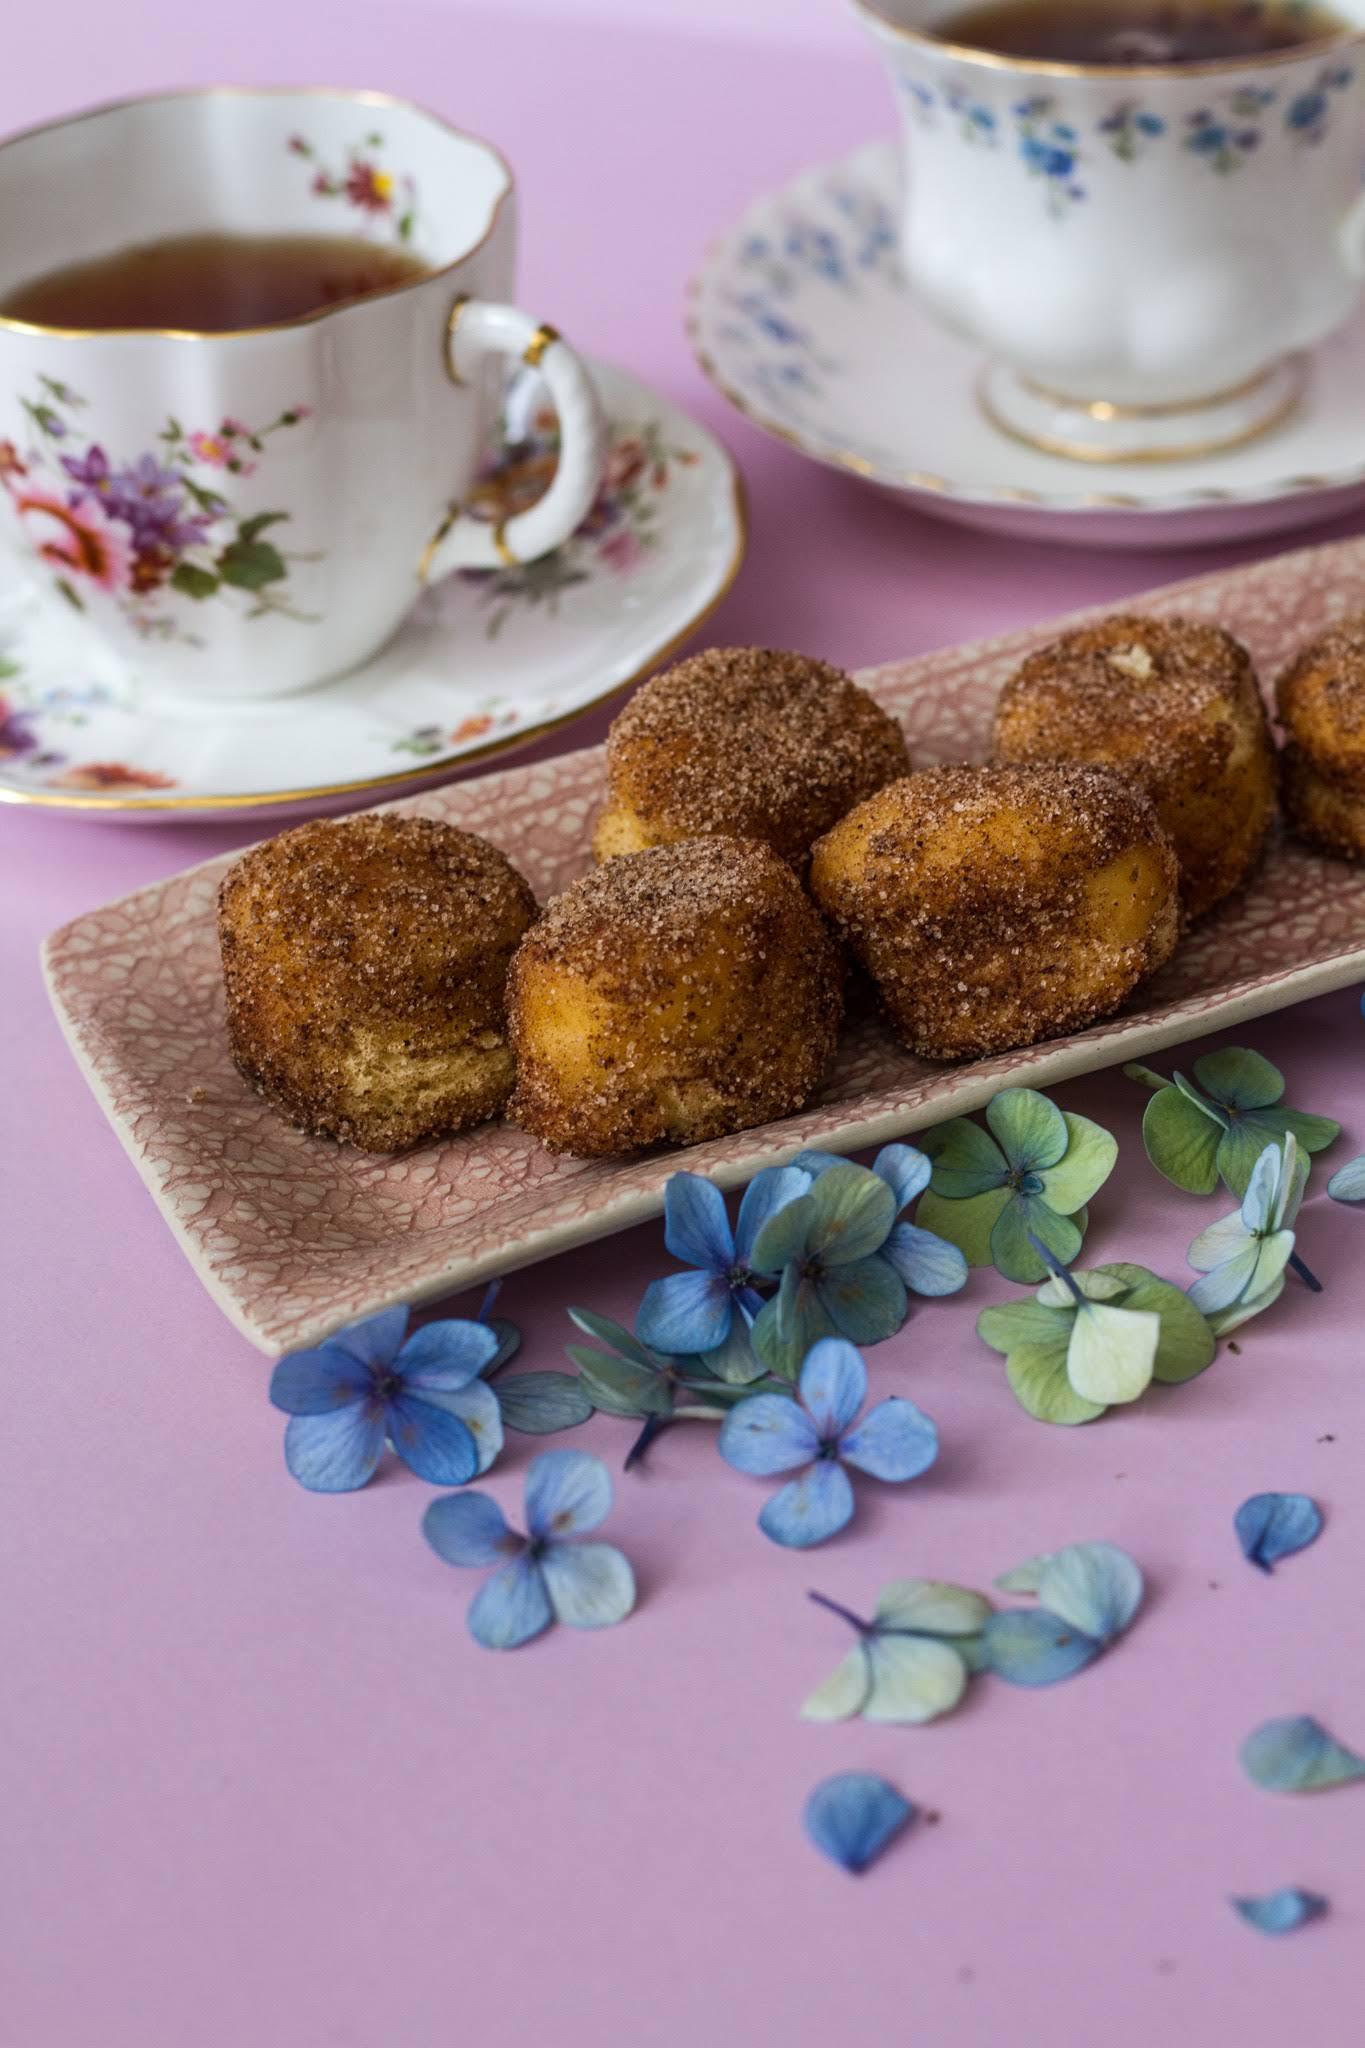 Donut bites & tea